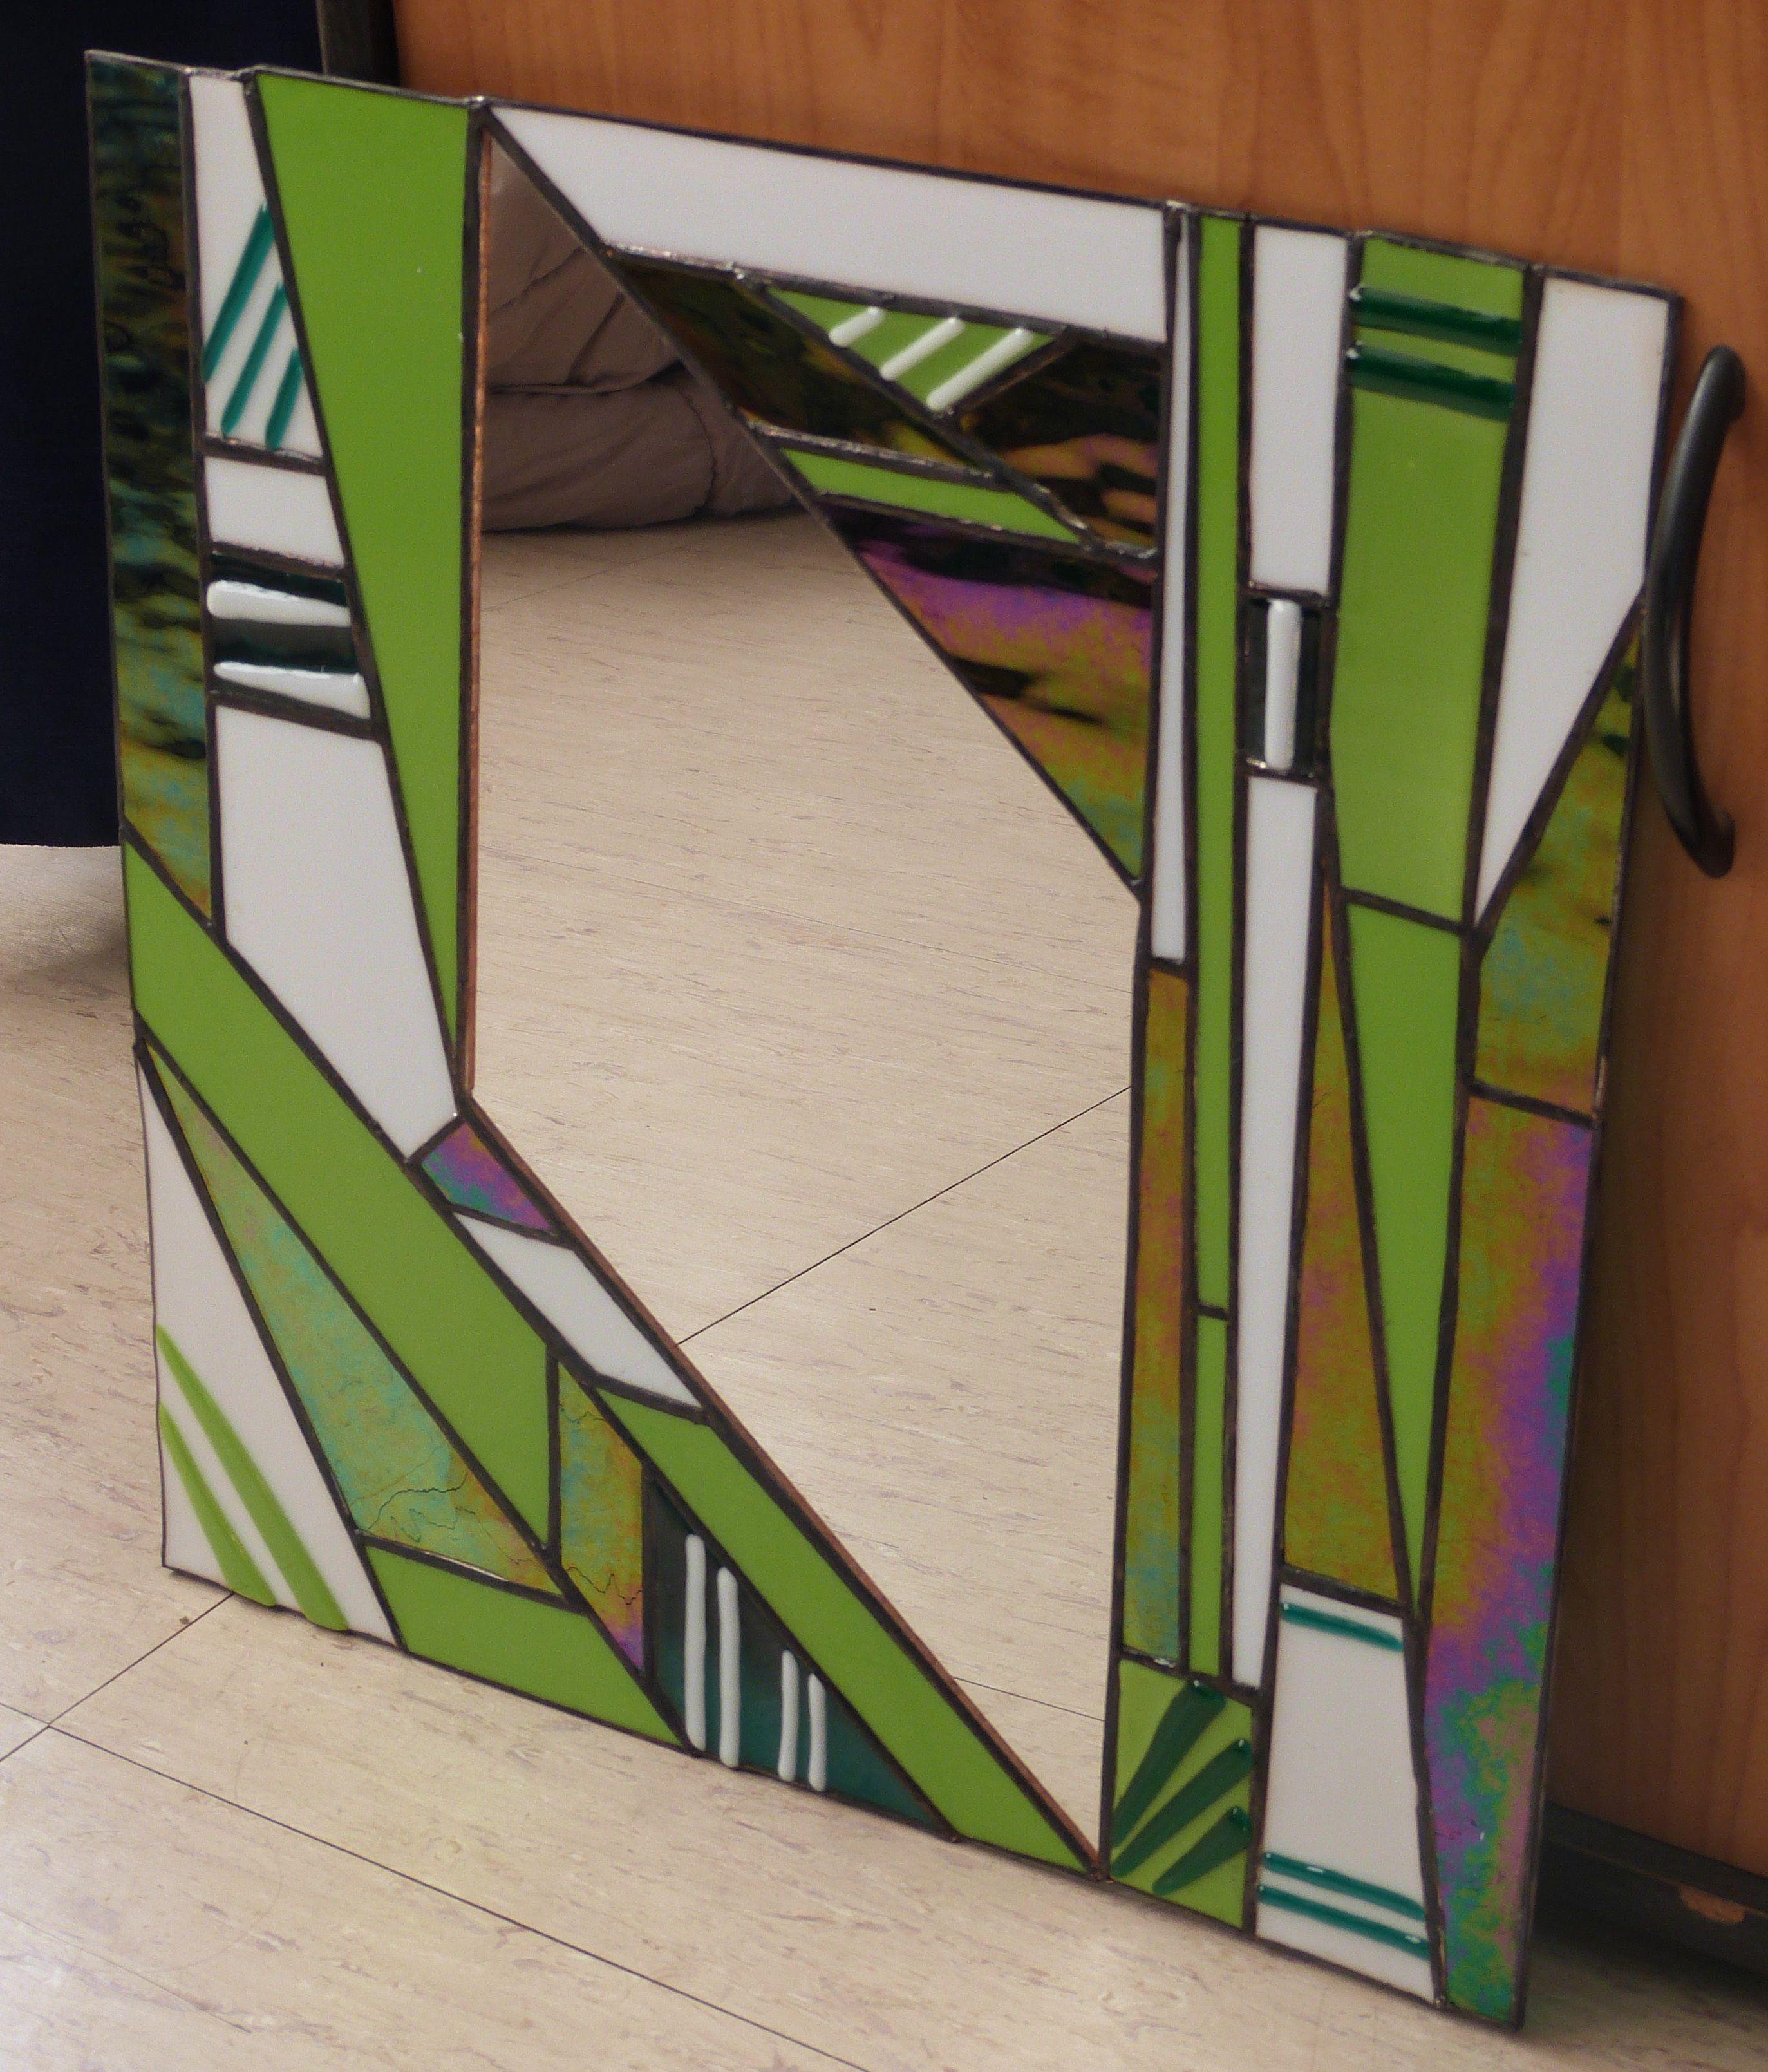 miroir vitrail art d co miroir pinterest. Black Bedroom Furniture Sets. Home Design Ideas